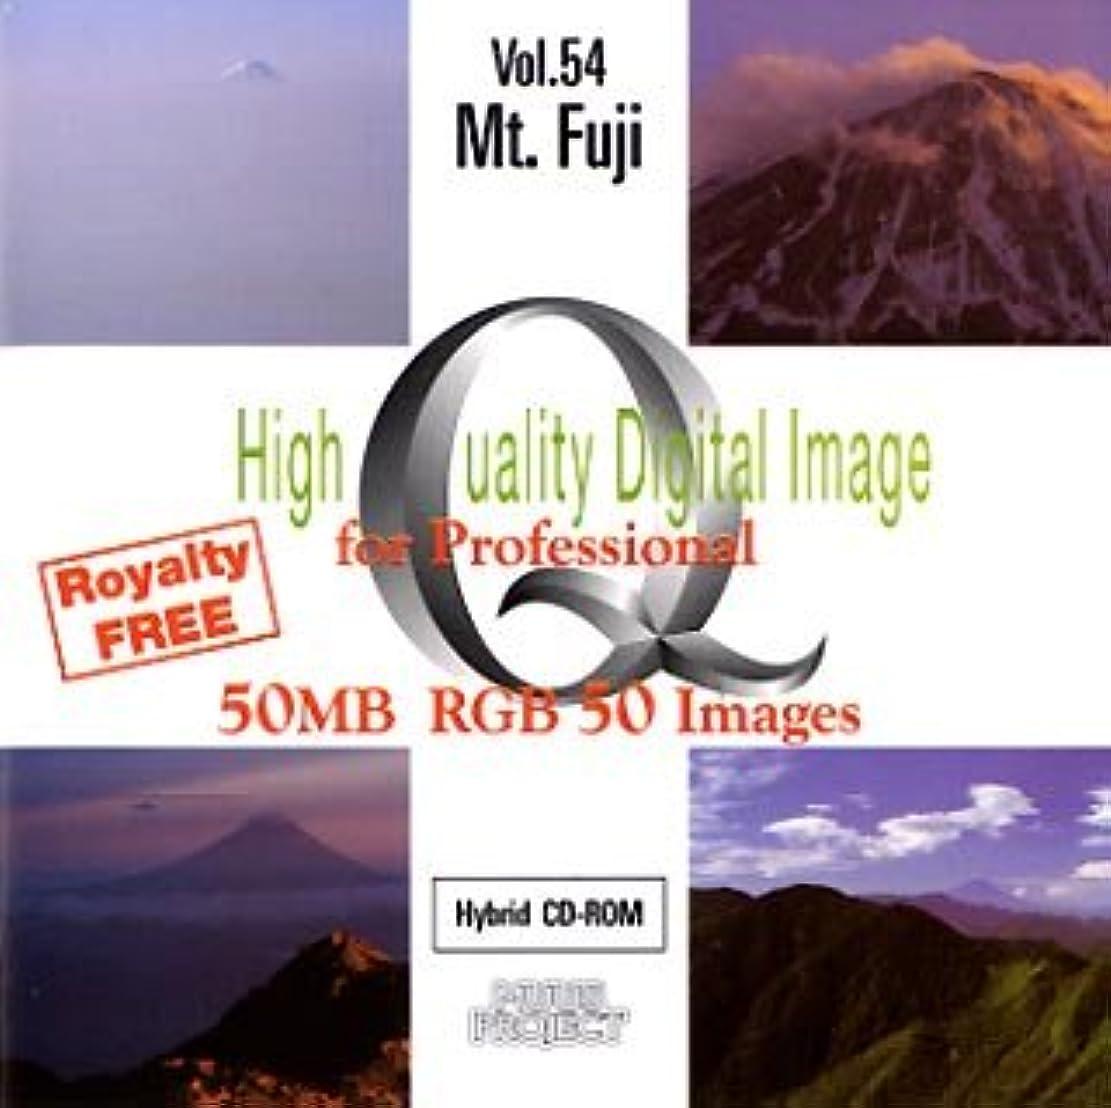 High Quality Digital Image for Professional Vol.54 Mt.Fuji